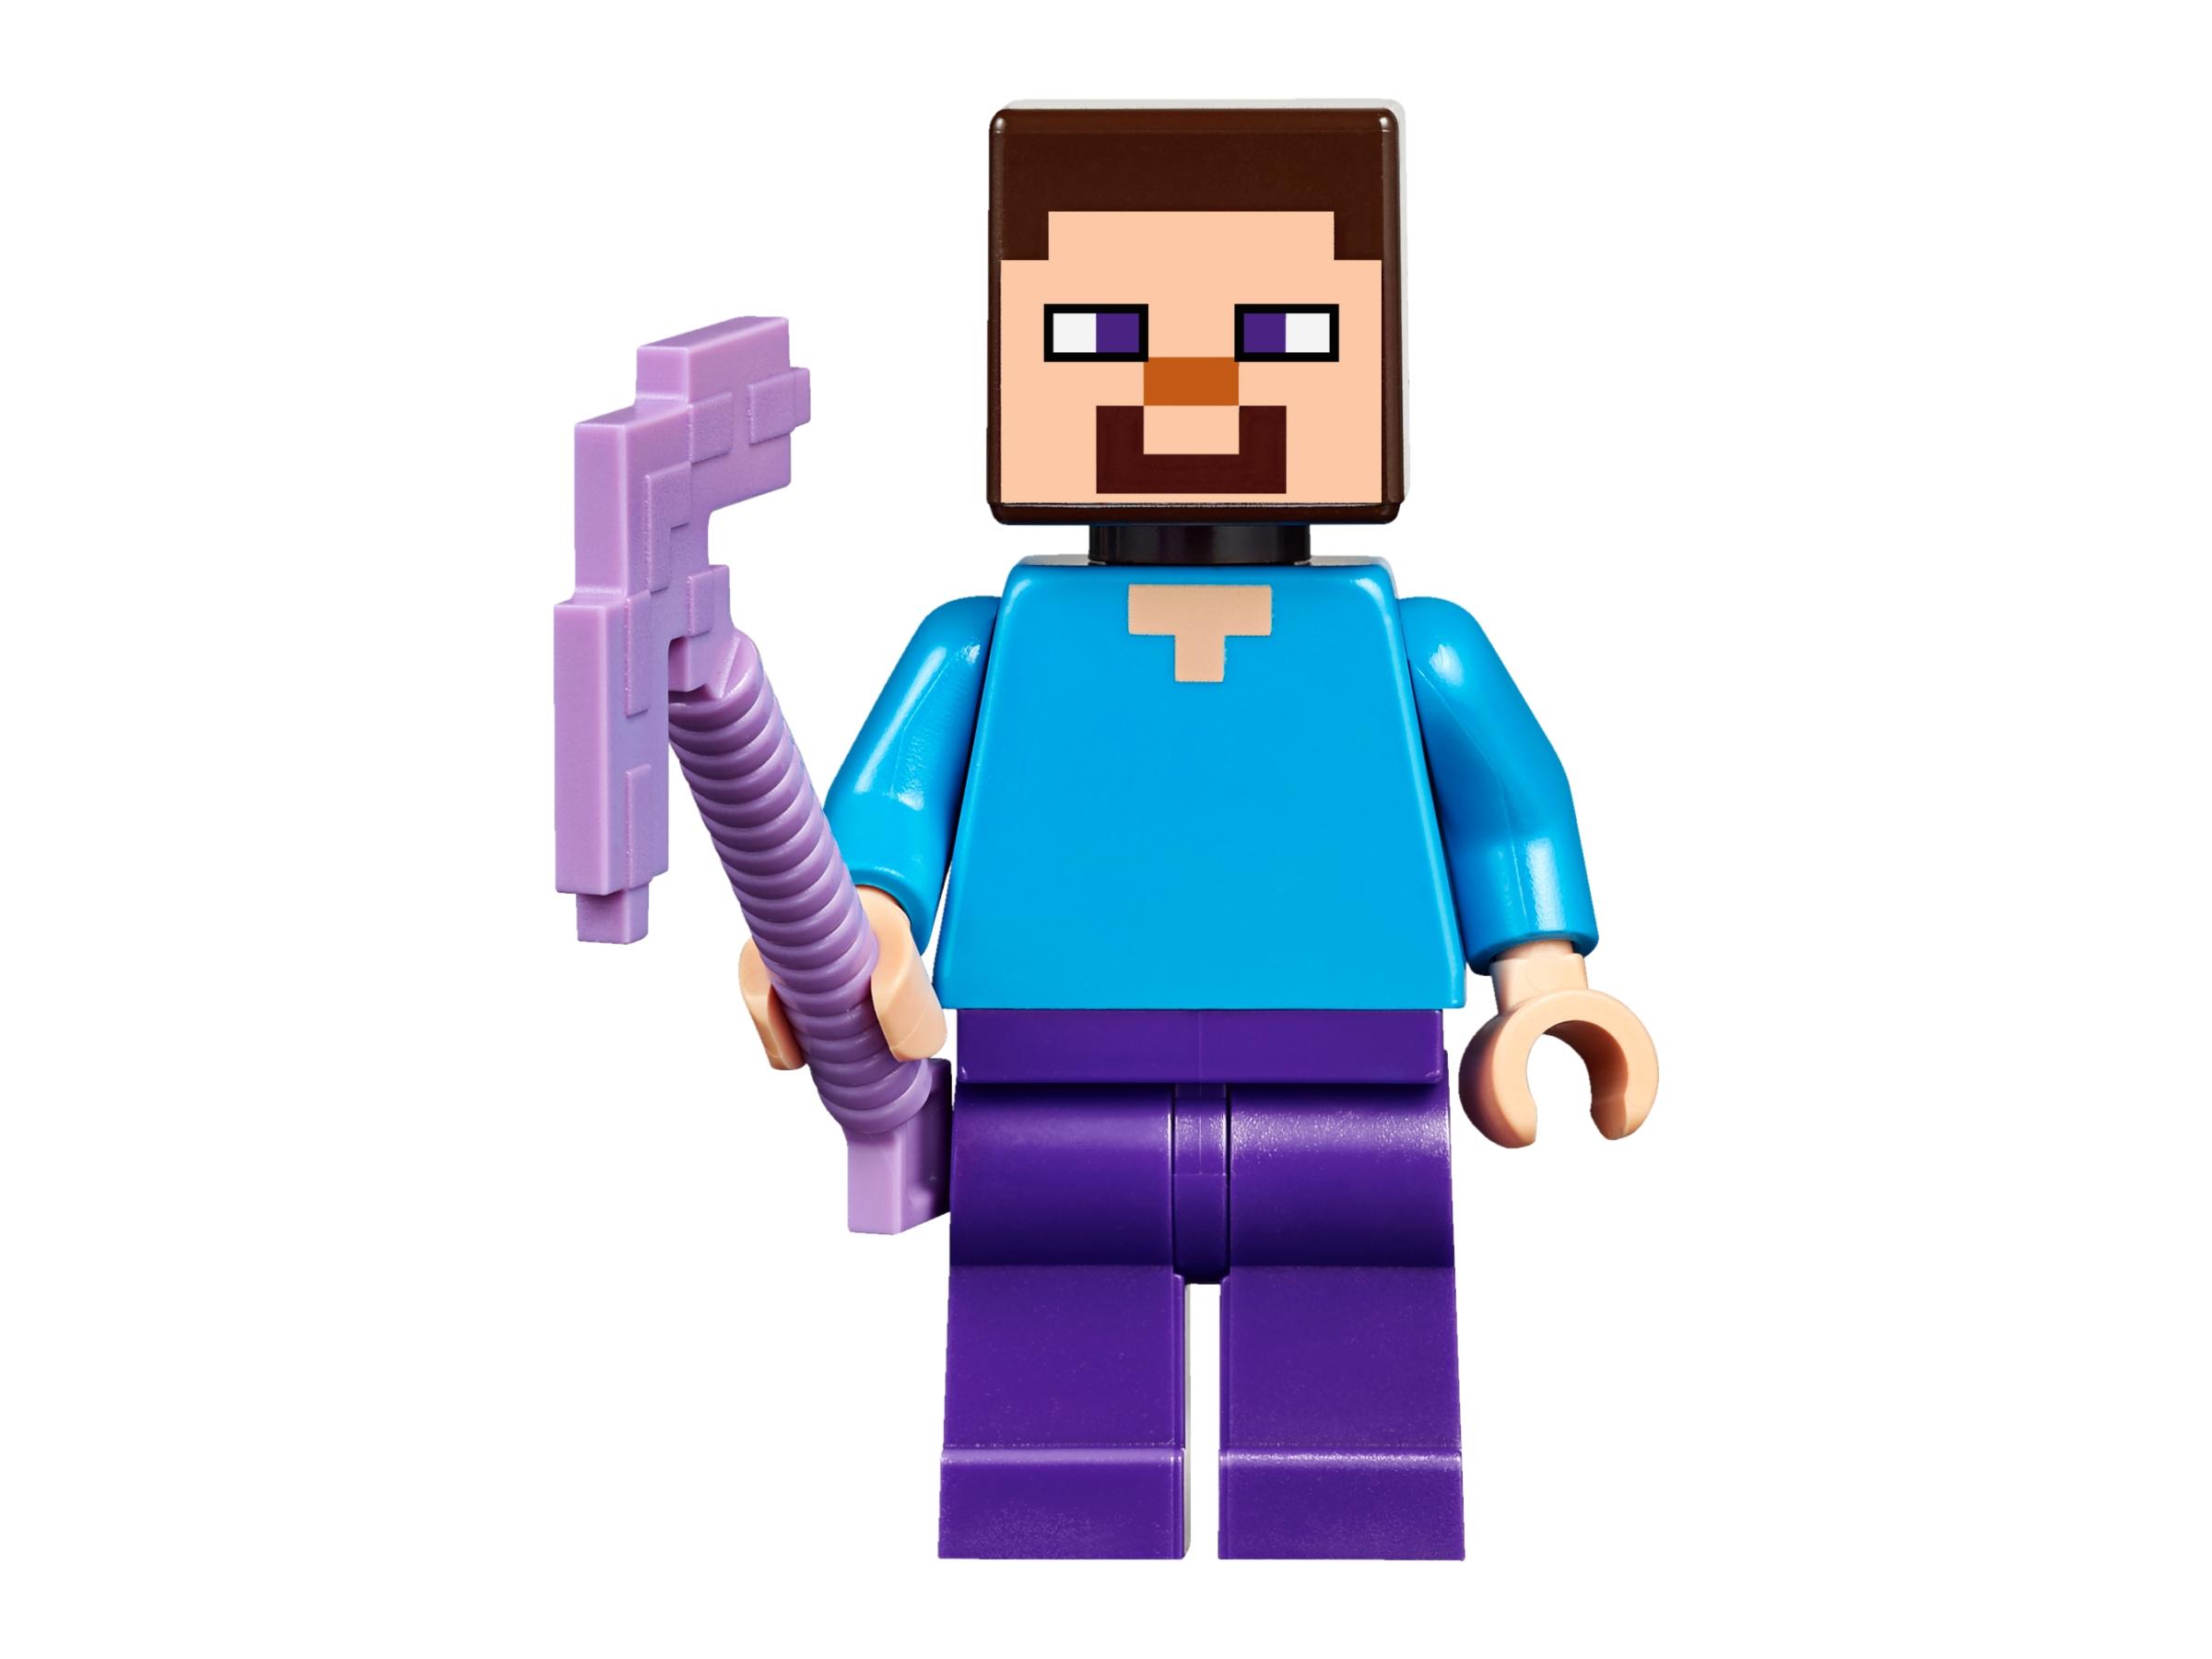 New Minifigure Custom Lego Alex with Purple Sword Character Minecraft Video Game